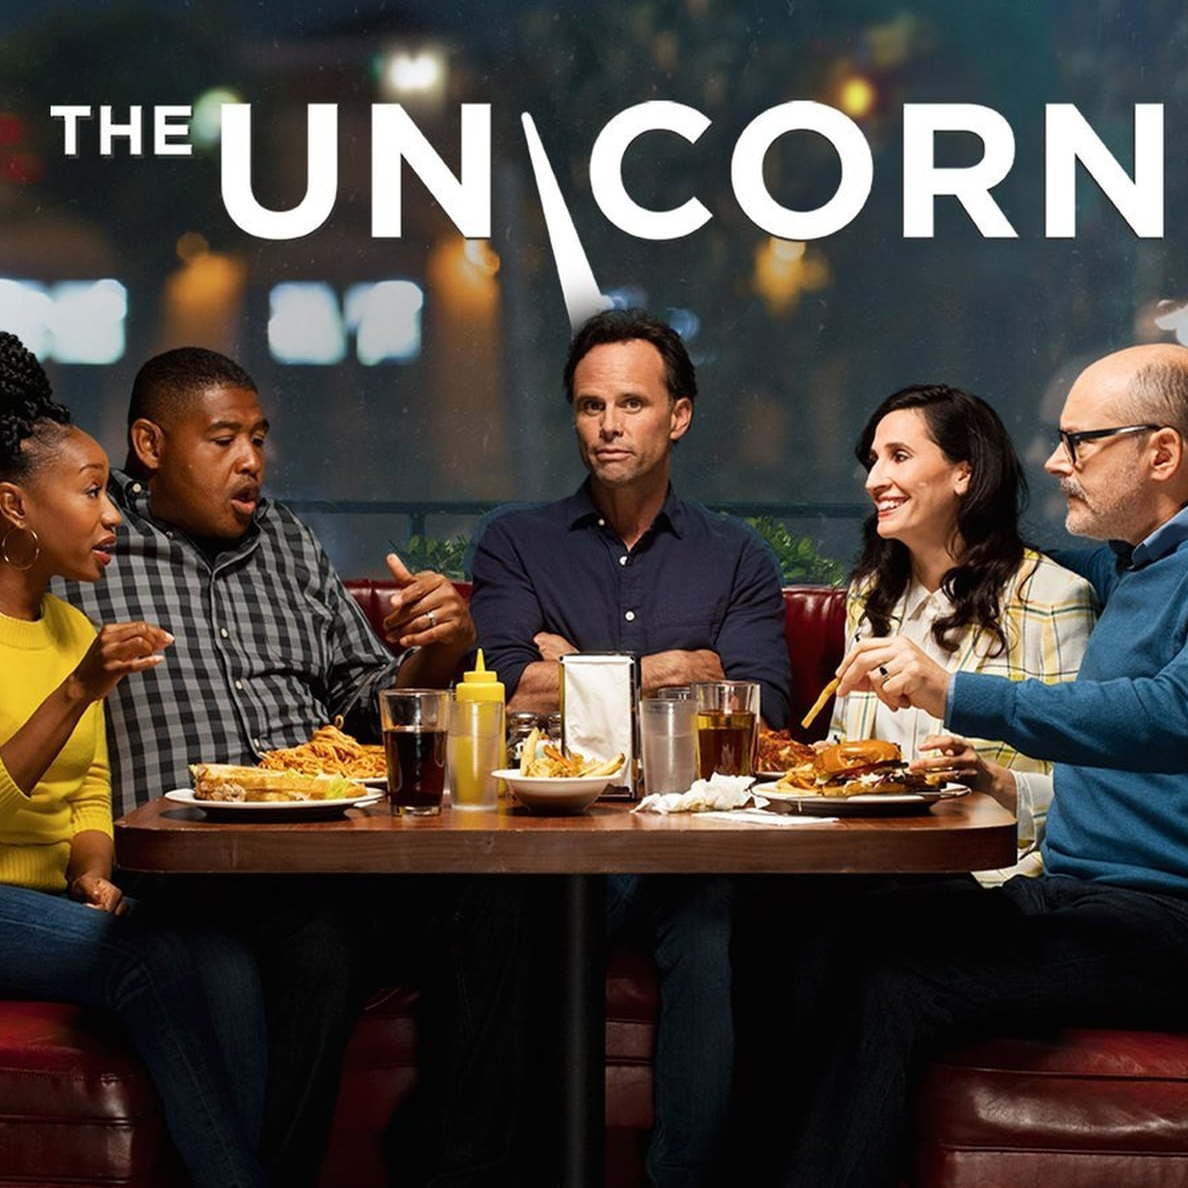 The Unicorn case study